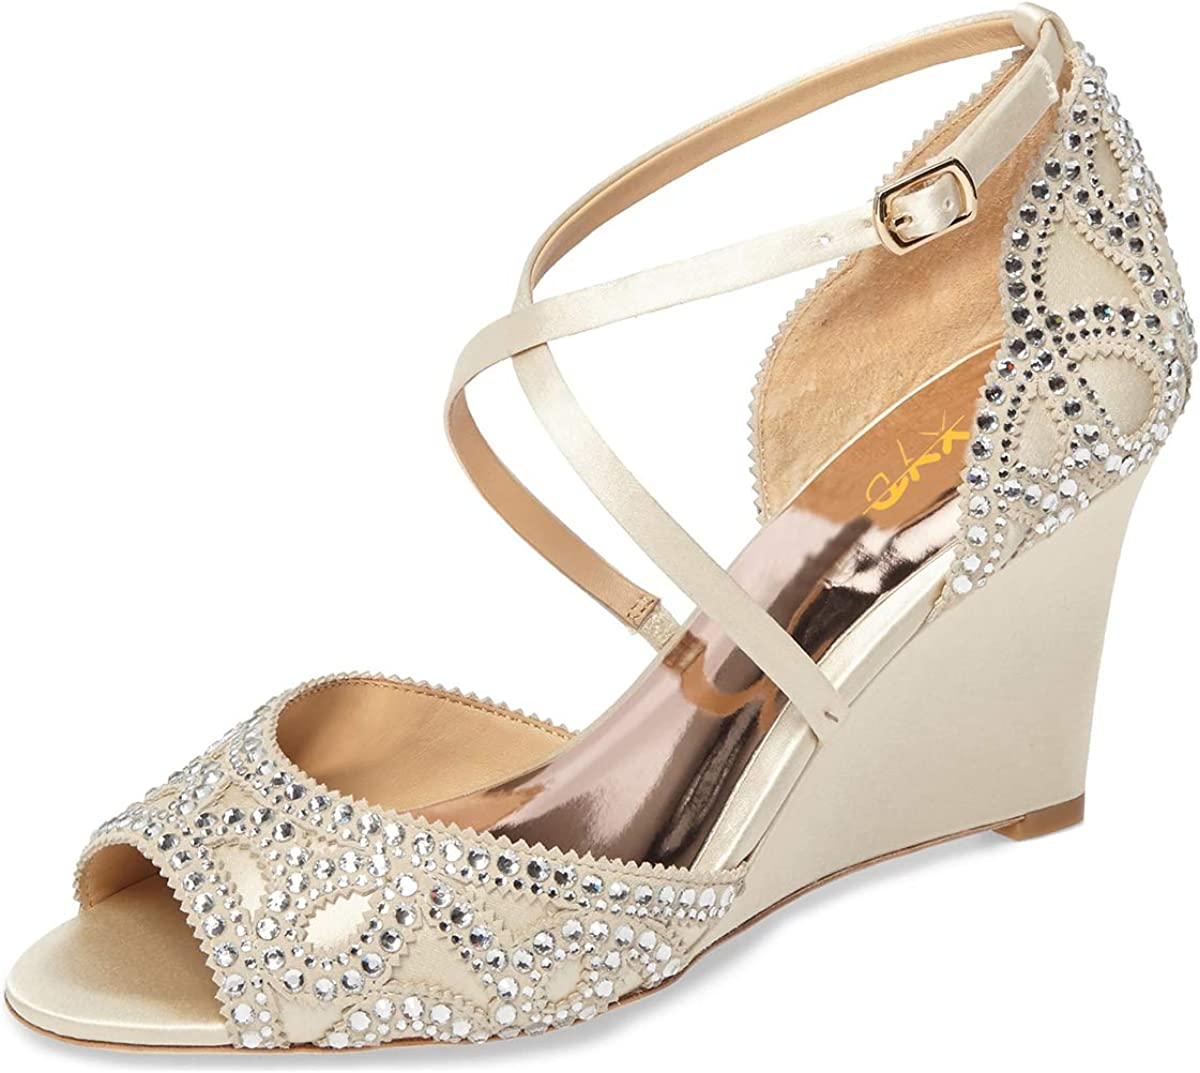 XYD Women Fashion Wedge Sandals 爆買い送料無料 Peep AL完売しました。 Toe Strap Rhines Crisscross